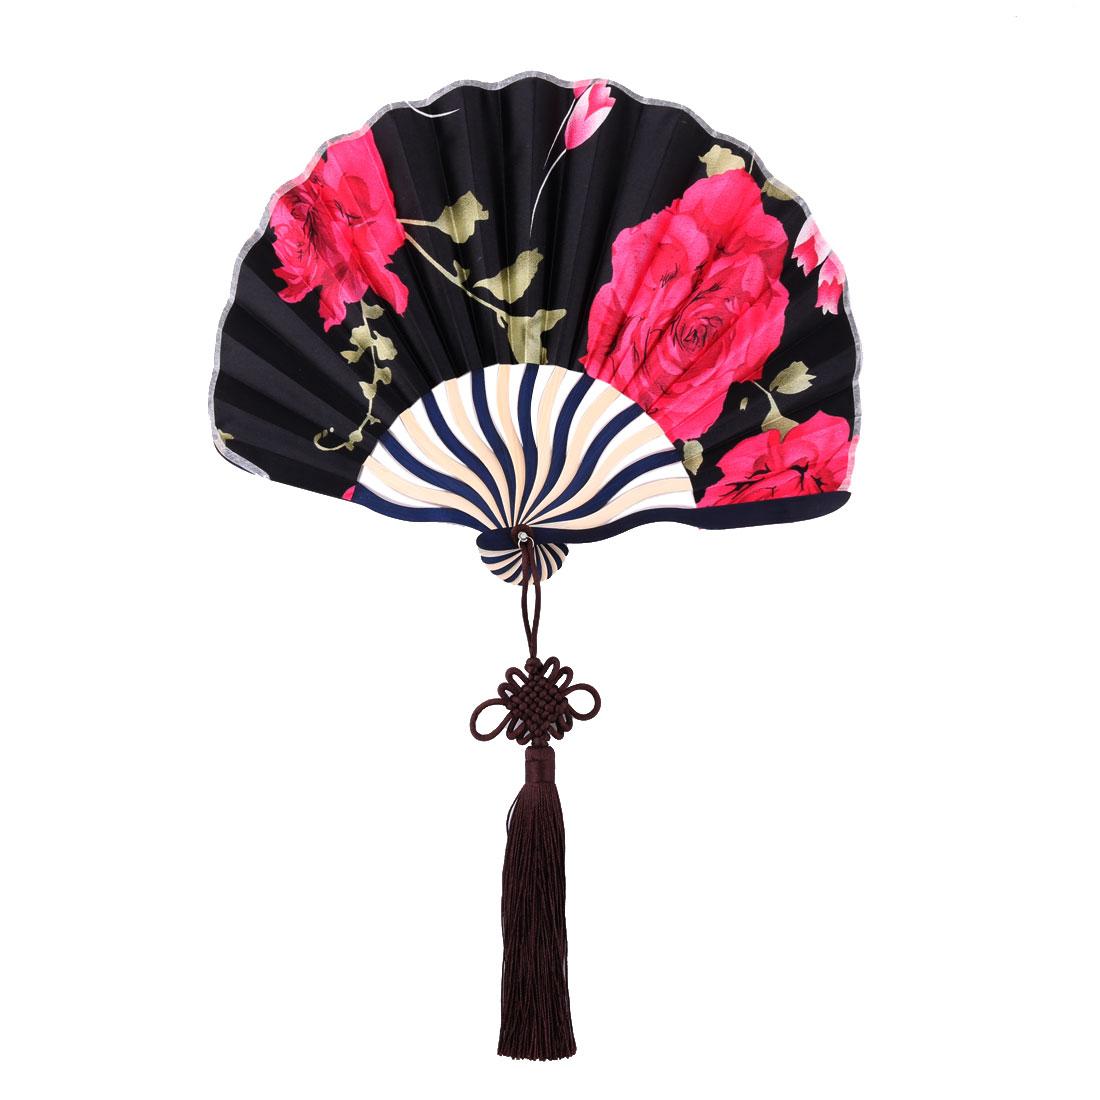 Bamboo Frame Flower Pattern Chinese Style Handheld Dancing Folding Fan Black Fuchsia